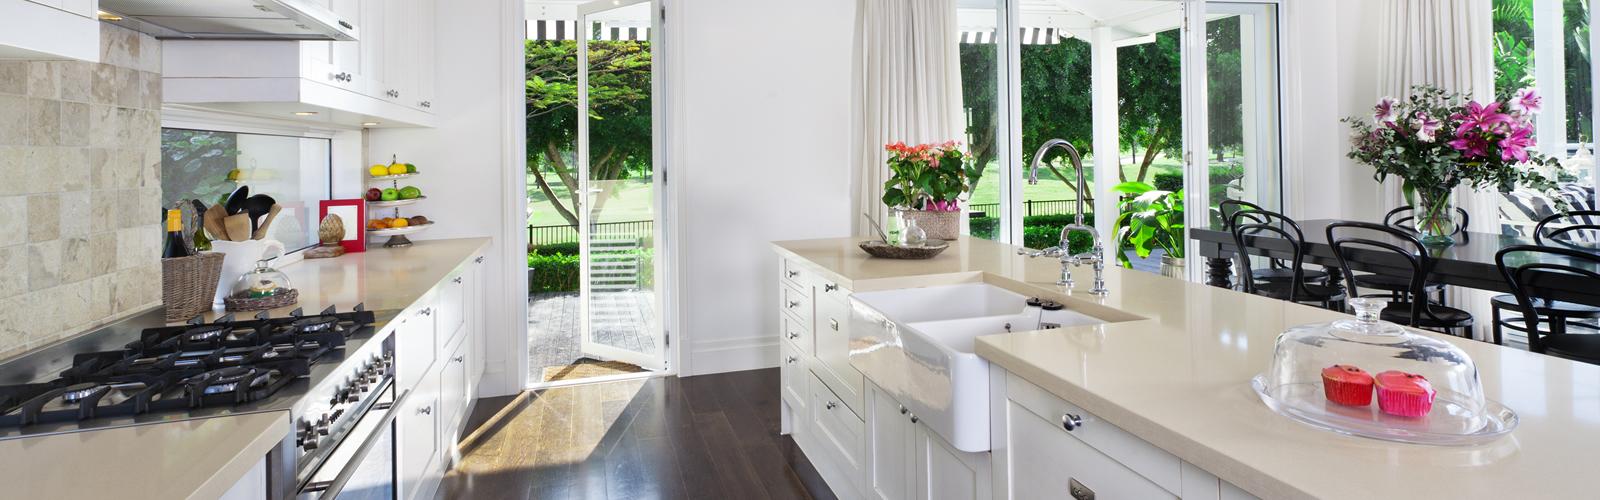 Homes For Sale | Natalia Ovsey Real Estate